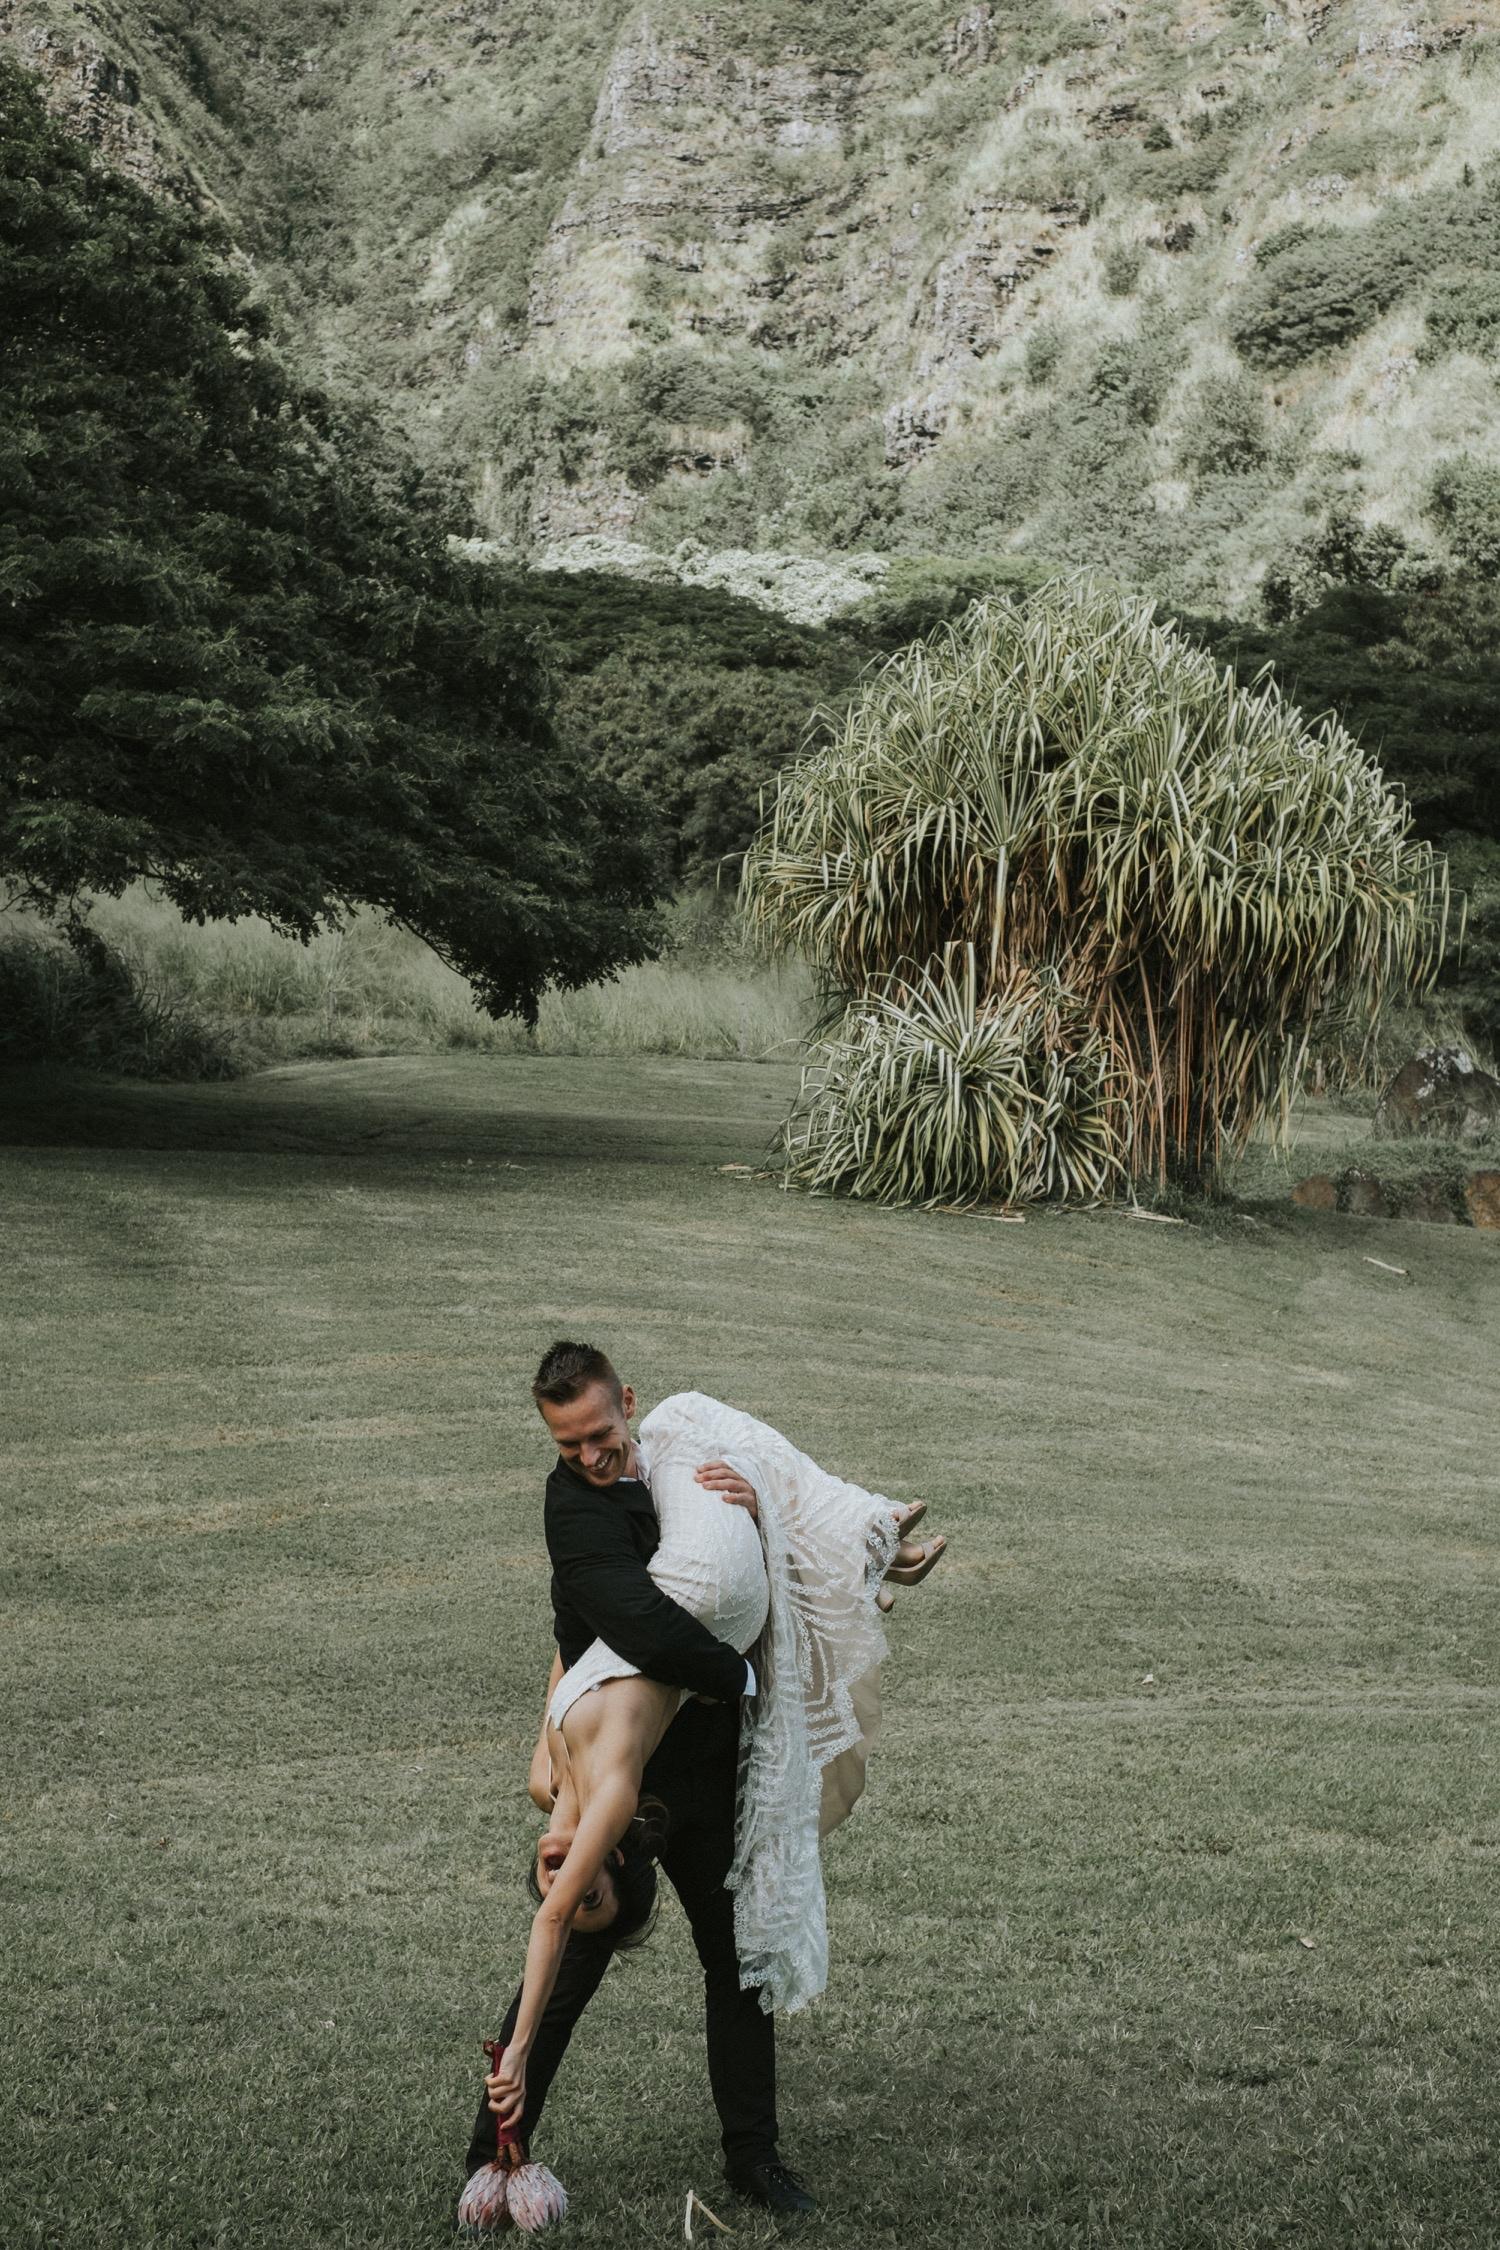 kualoa ranch, wedding at kualoa ranch, kualoa ranch wedding photographer, oahu wedding photographer, elopement at kualoa ranch, jurassic park wedding, destination wedding photographer, oahu elopement